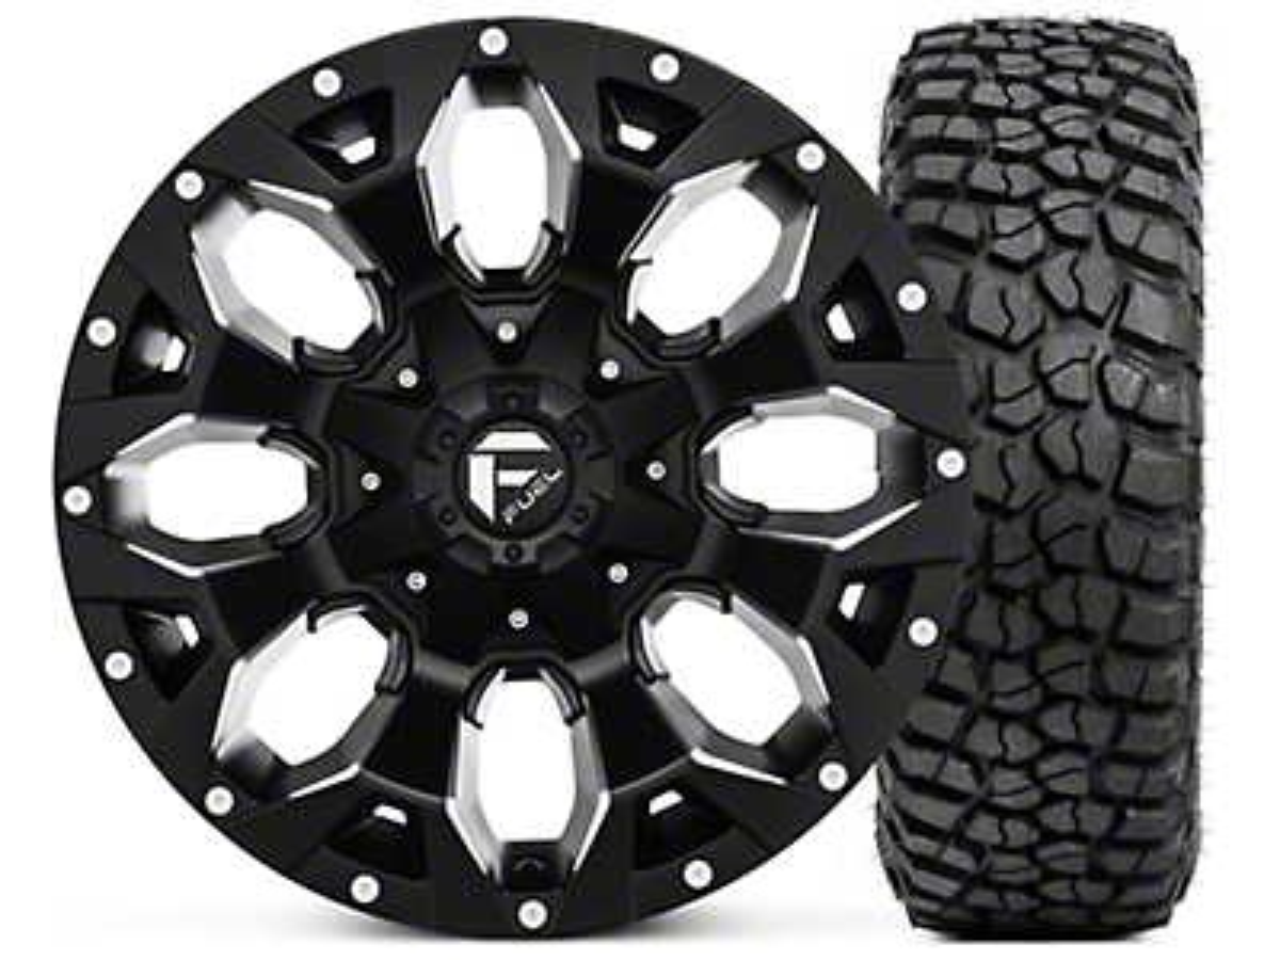 Fuel Wheels Assault Black Machined Wheel 17x9 and BF Goodrich Mud Terrain T/A KM2 265/70R17 Kit (07-18 Jeep Wrangler JK; 2018 Jeep Wrangler JL)